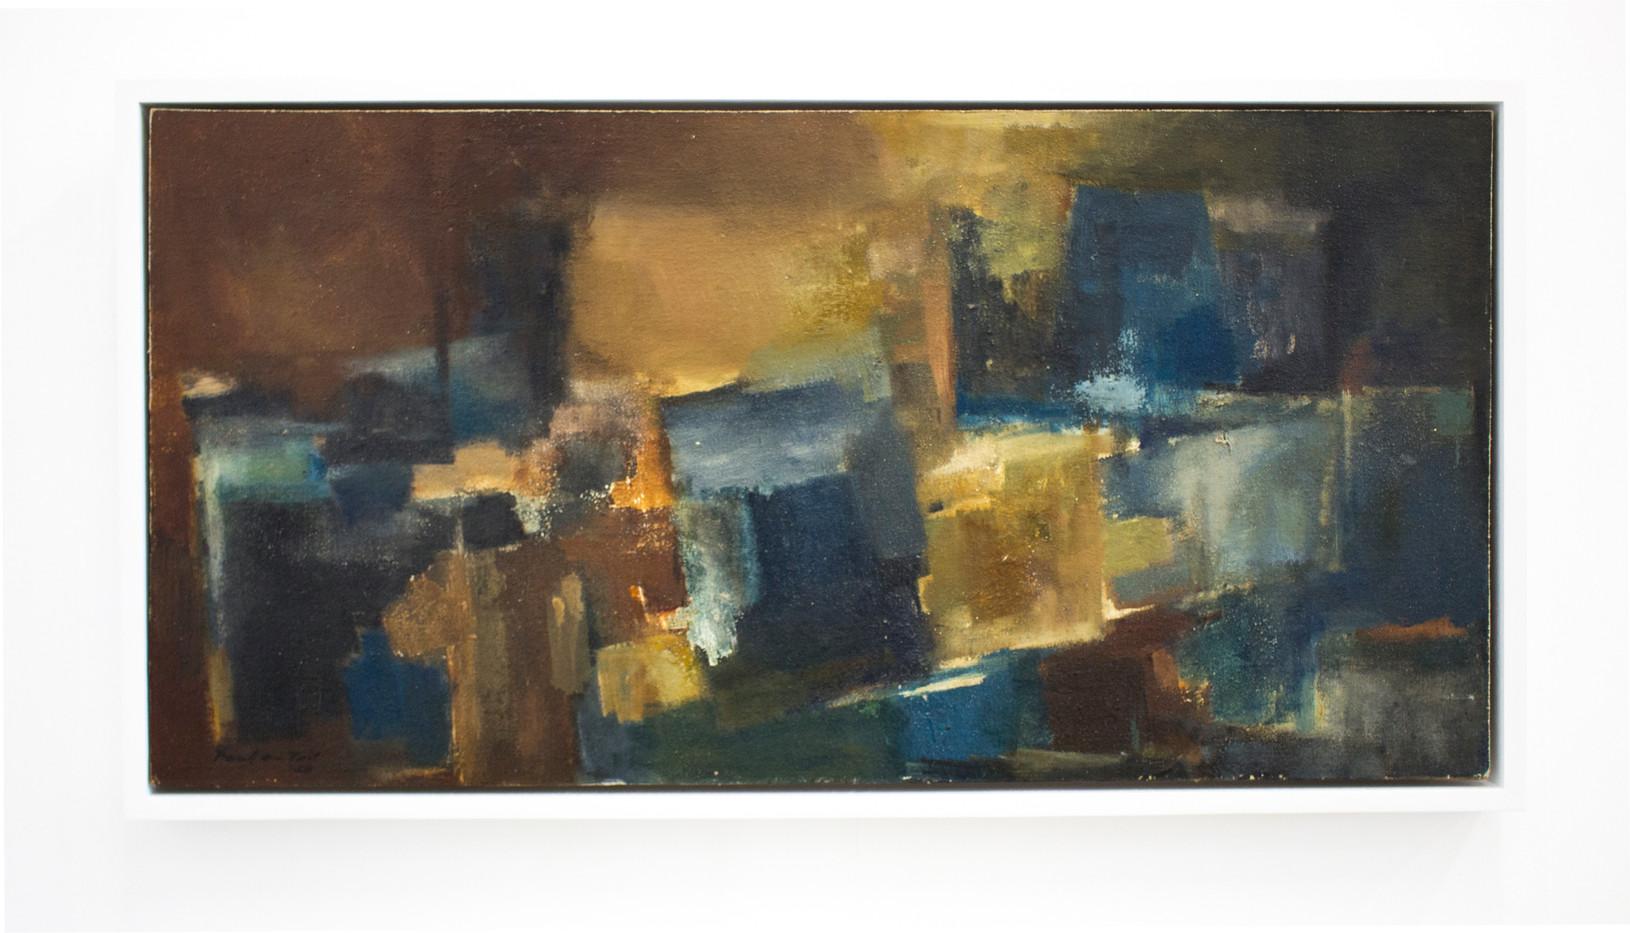 Paul Du Toit | Untitled | 1958 | Oil on Canvas on Board | 39.5 x 78 cm